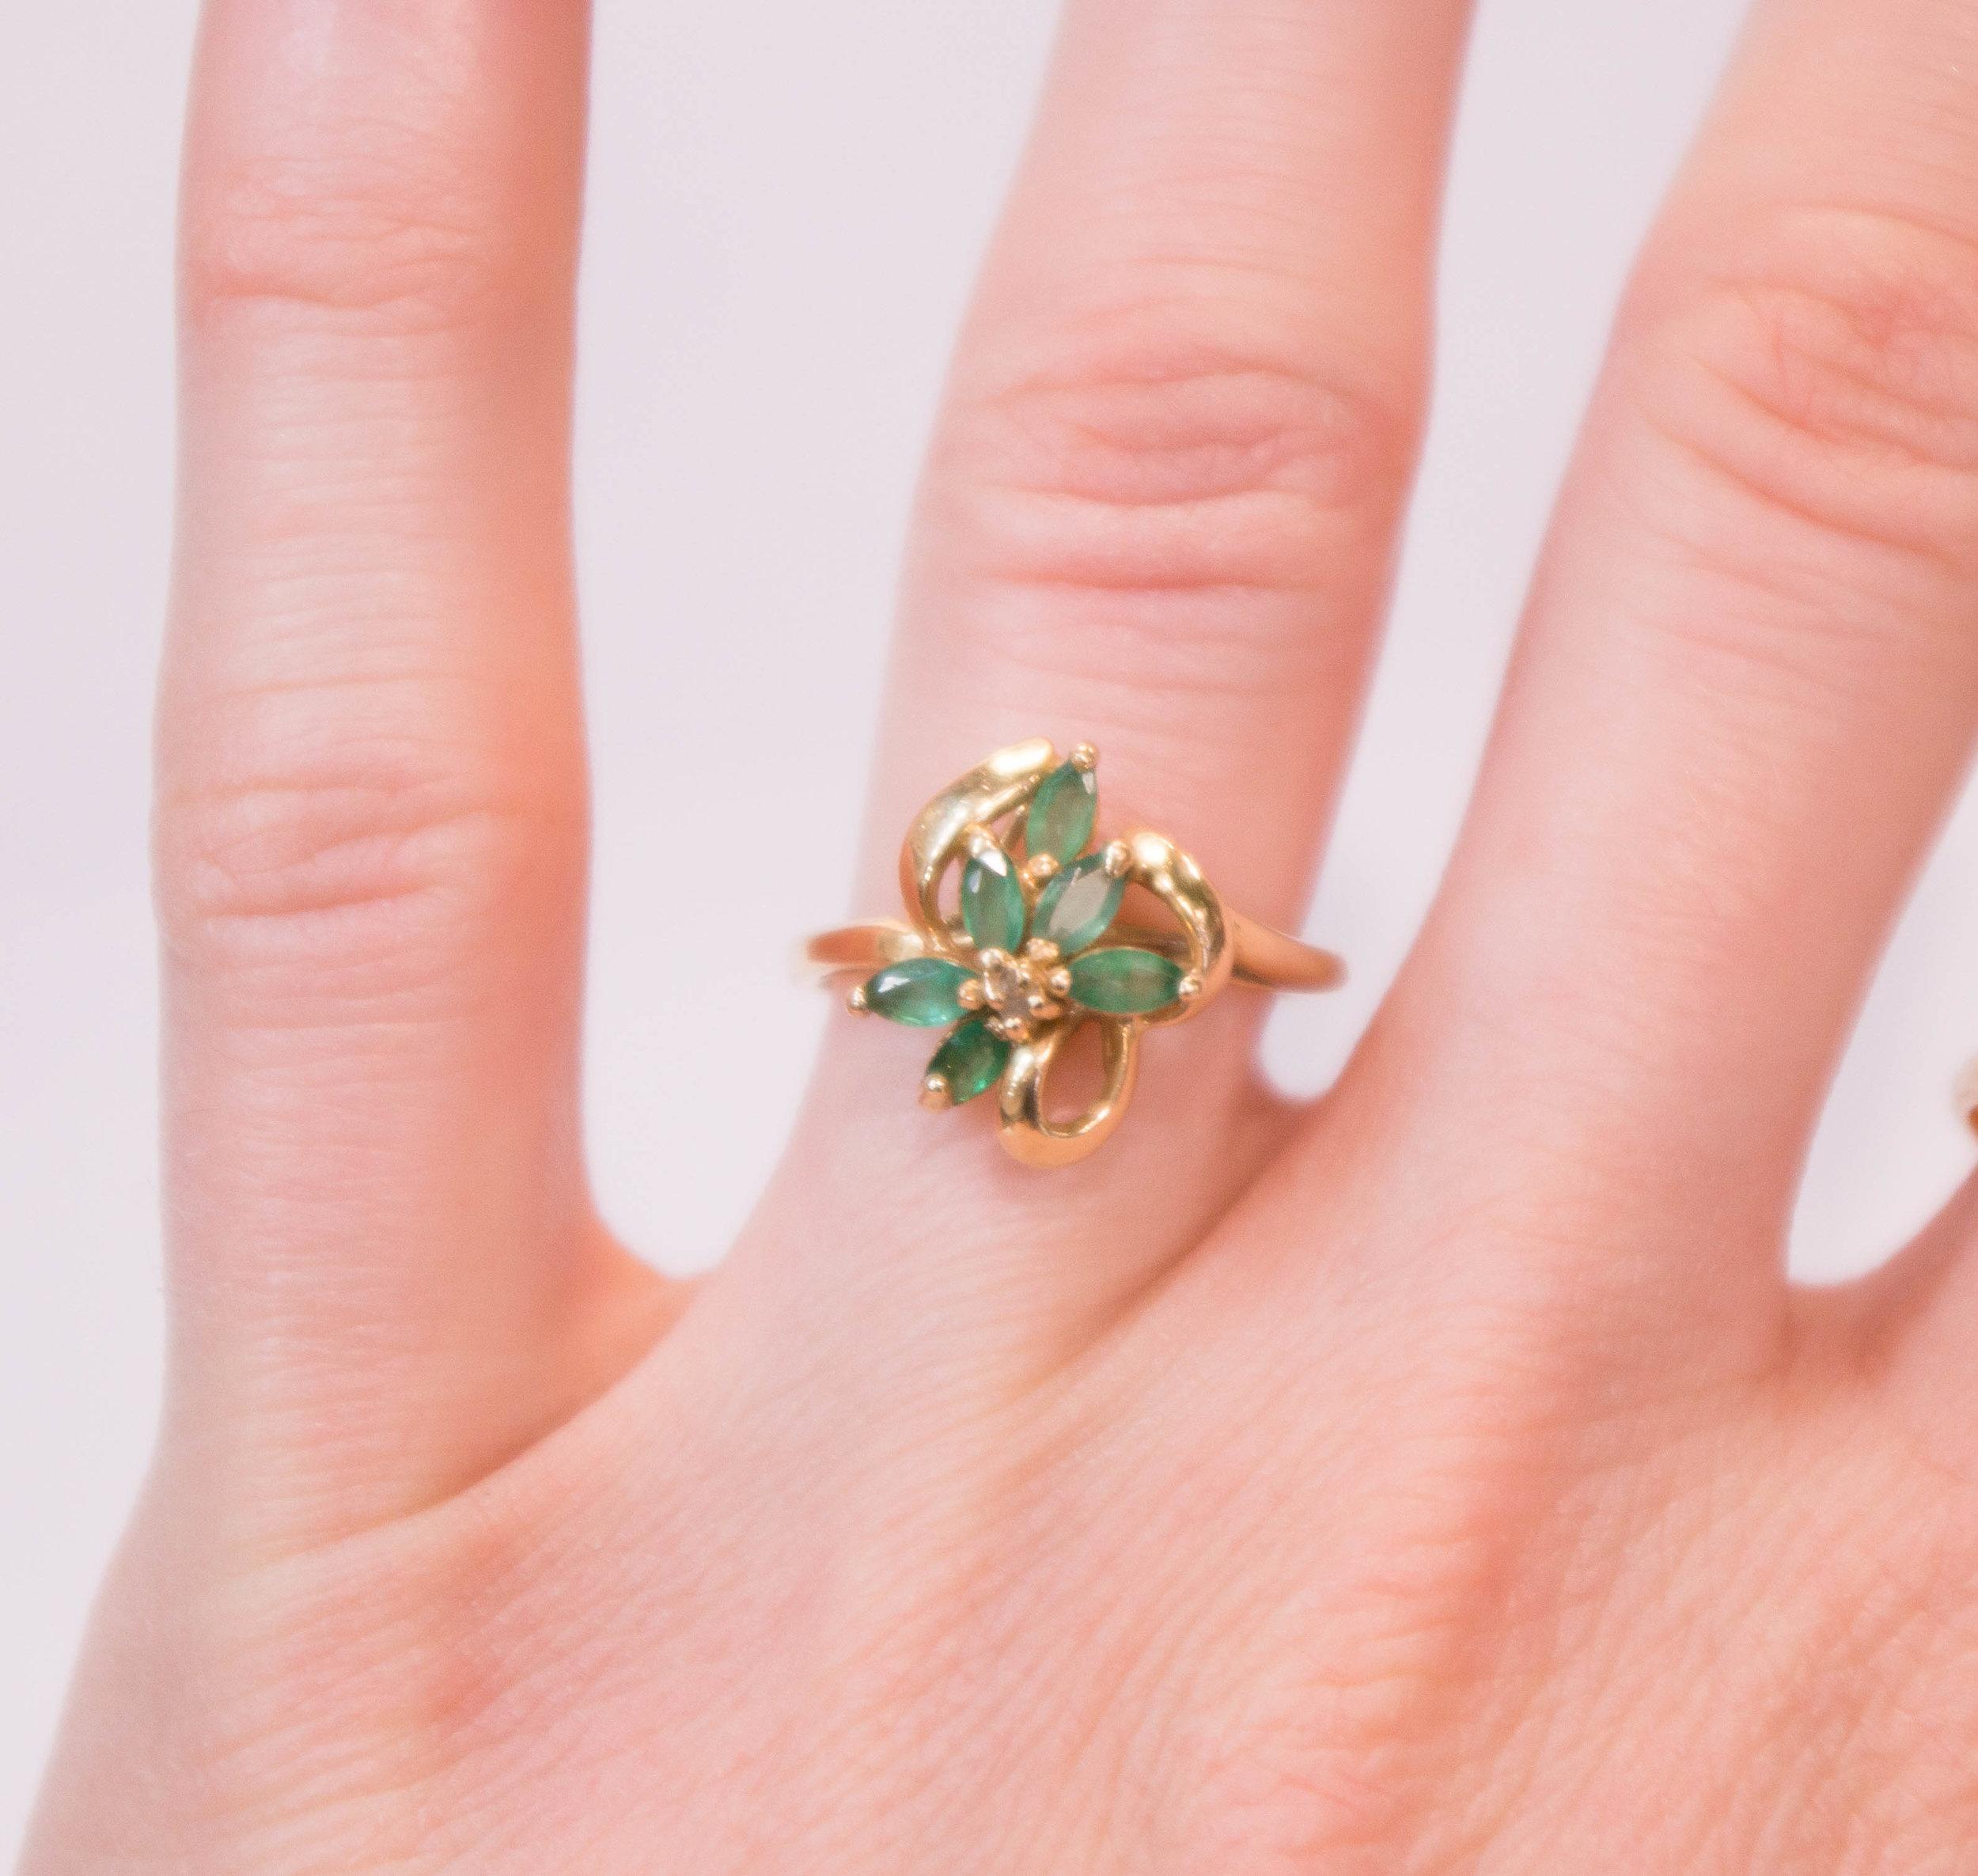 Estate 14KY Marquise Emeralds in Flower design on.JPG